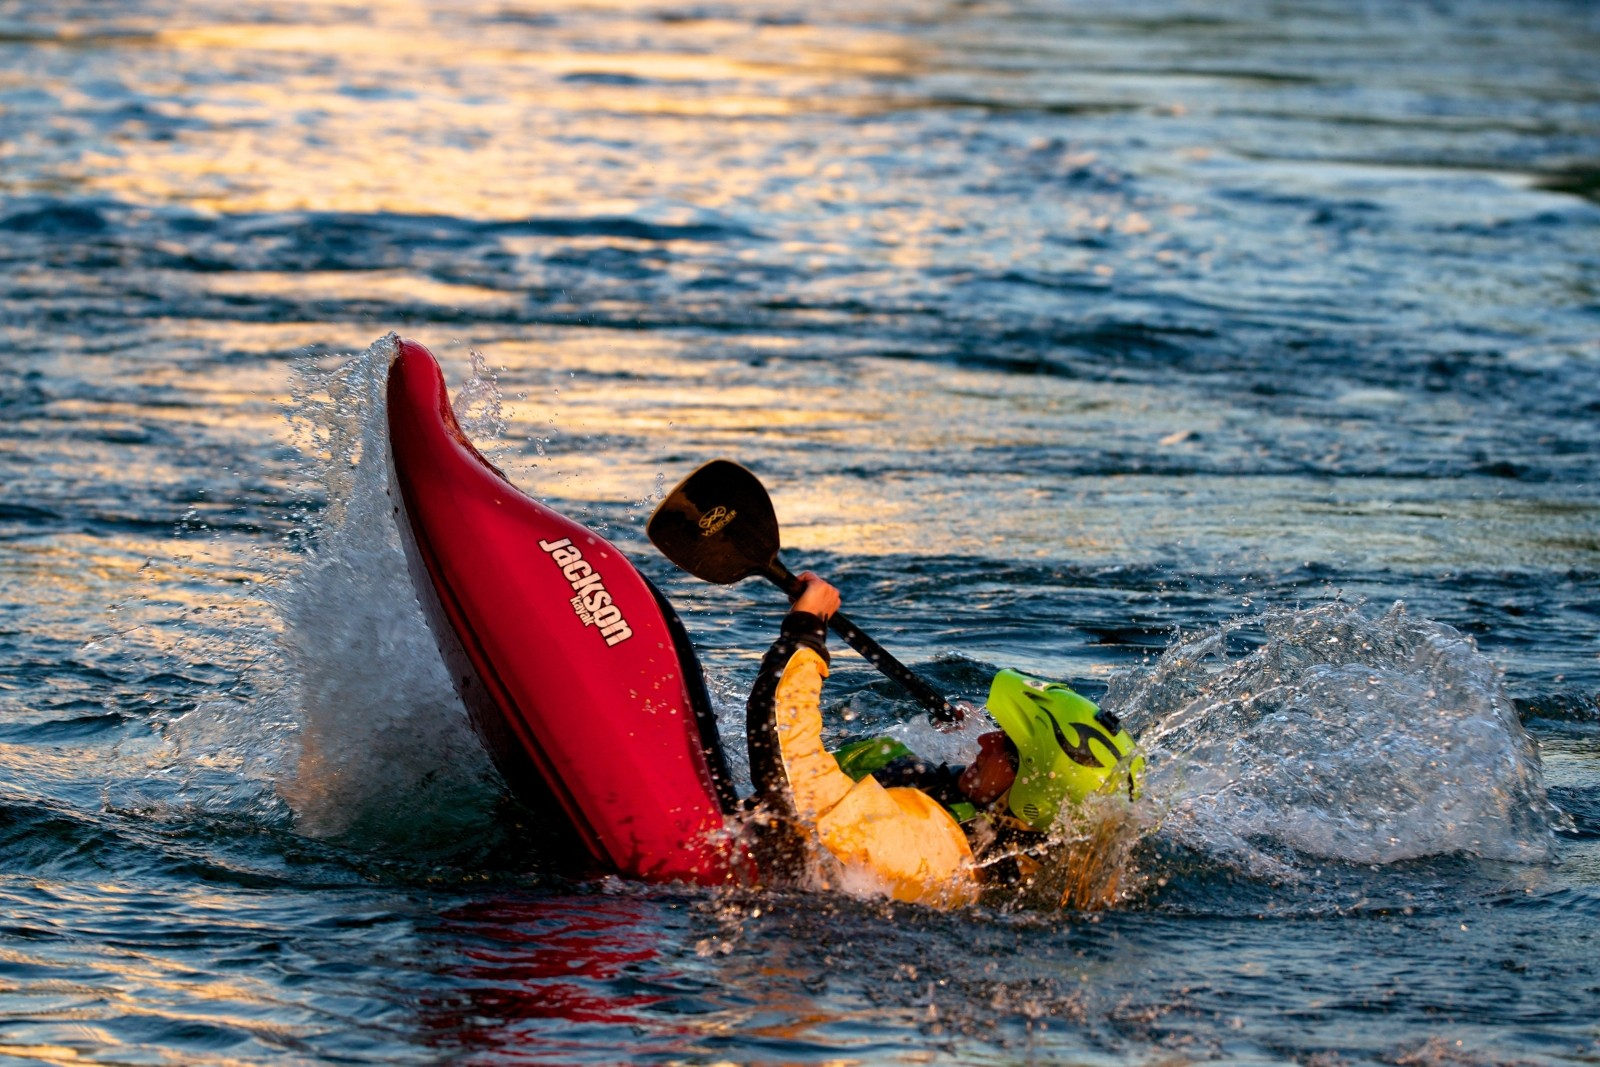 kayak-white-water-water-sports-courage-skill